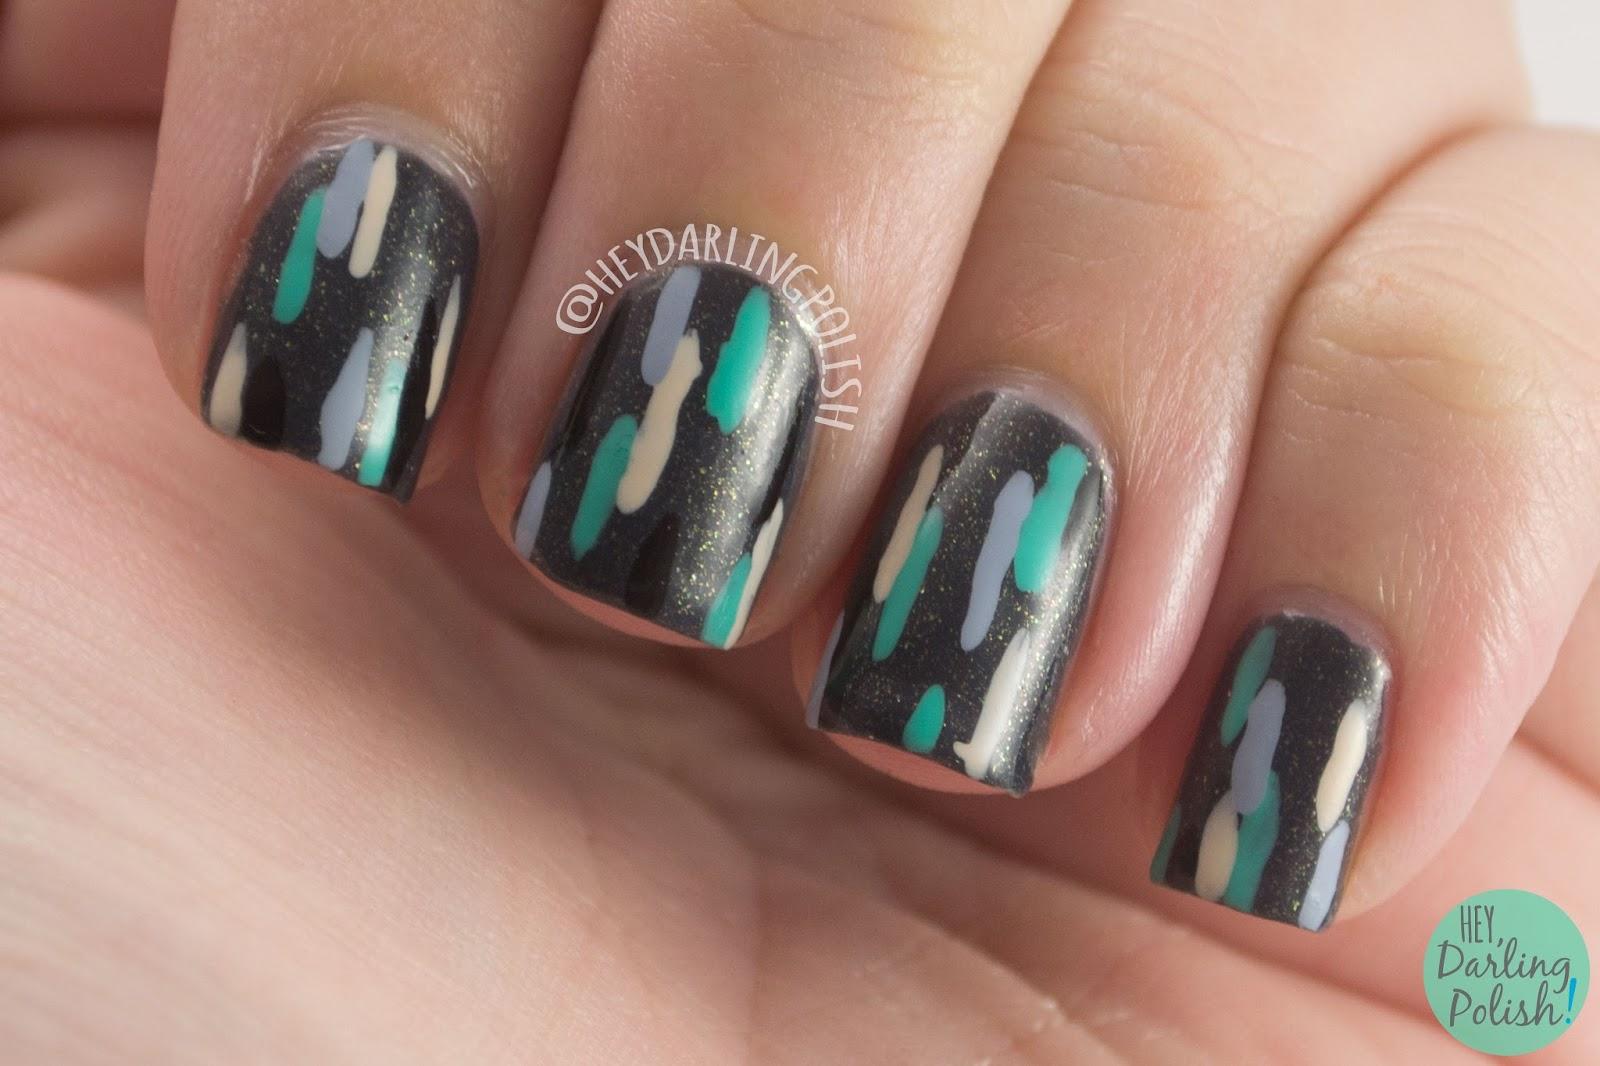 Line Art Nails : Hey darling polish line art part two